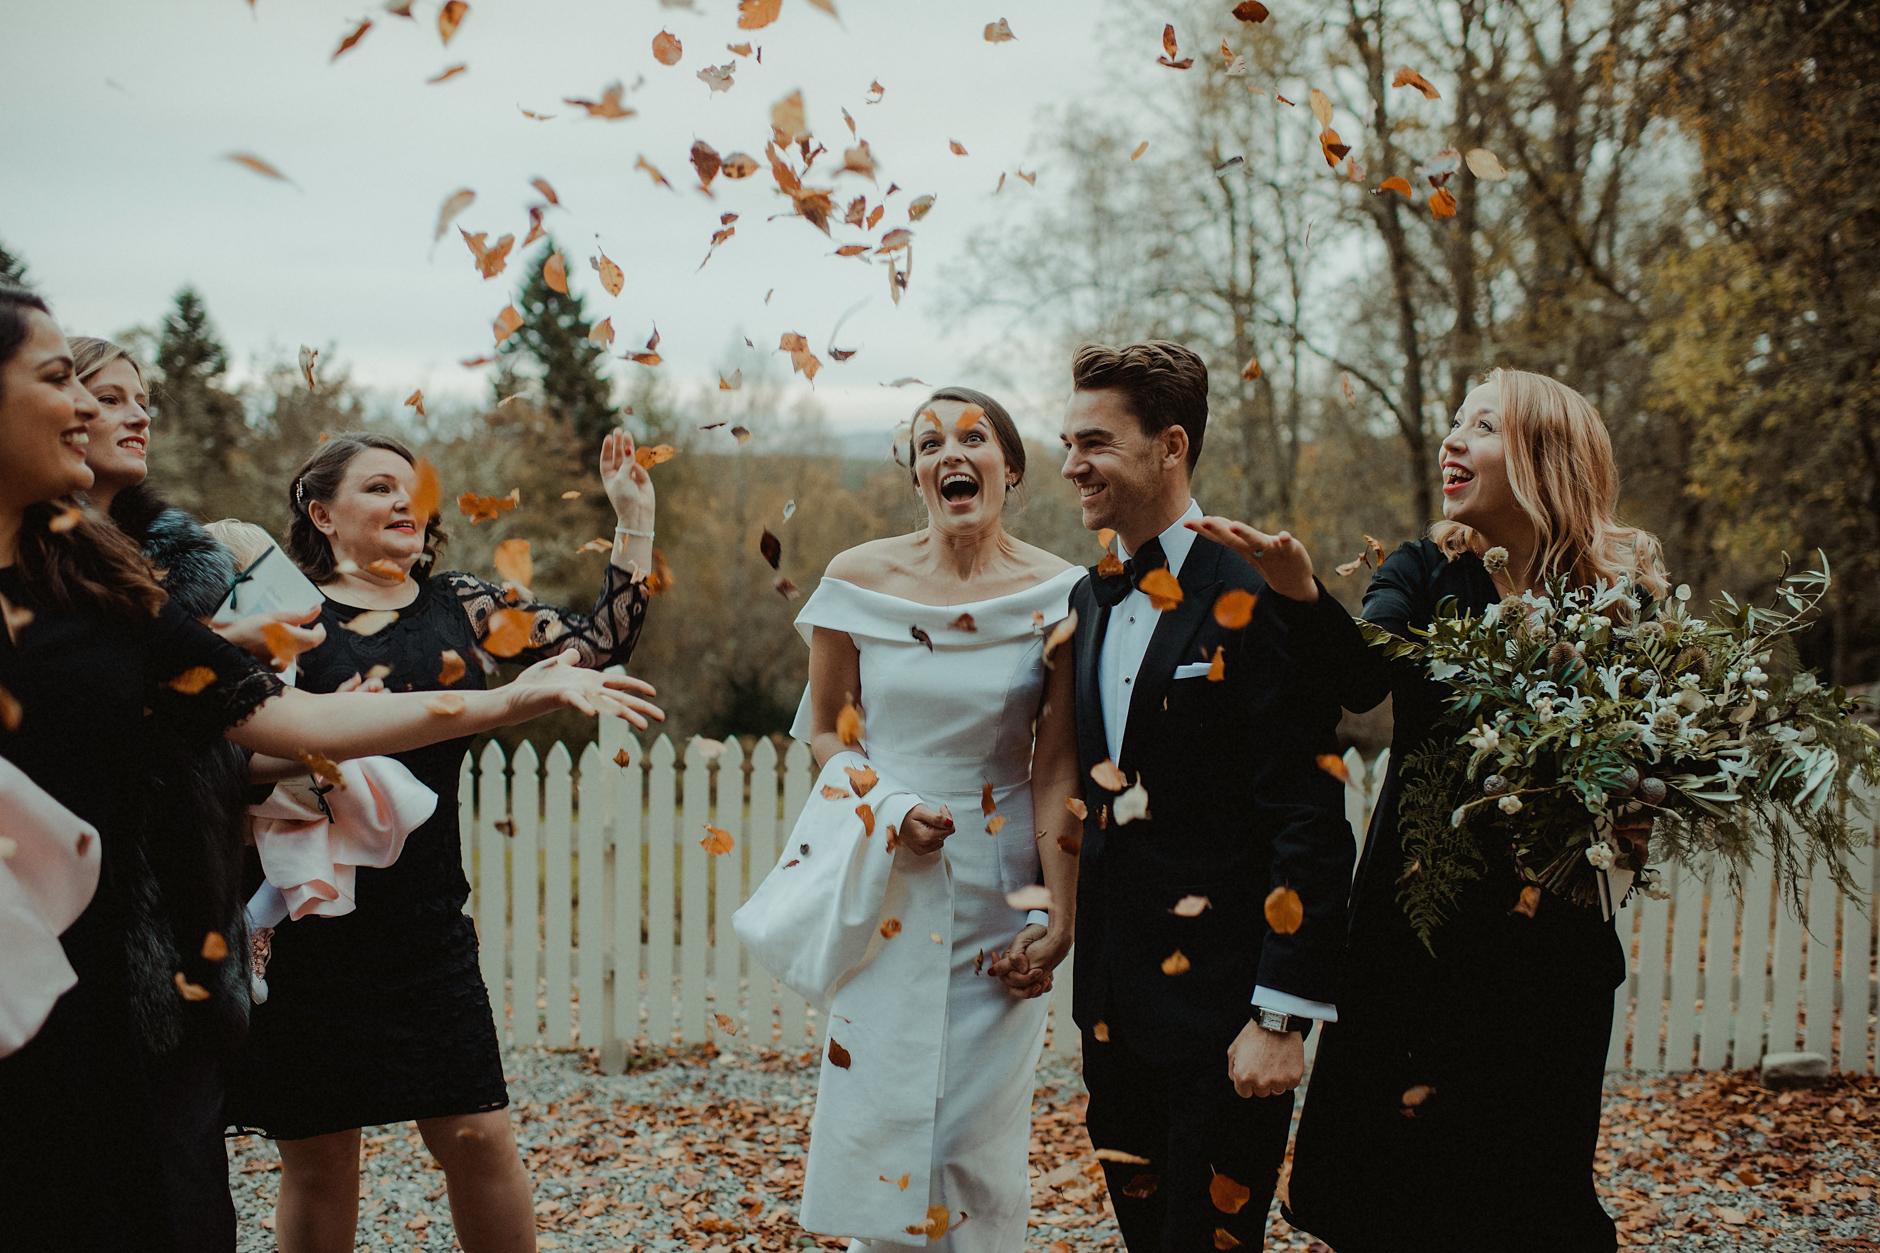 Glentruim-Wedding-Nikki-Leadbetter-Photography-116.jpg